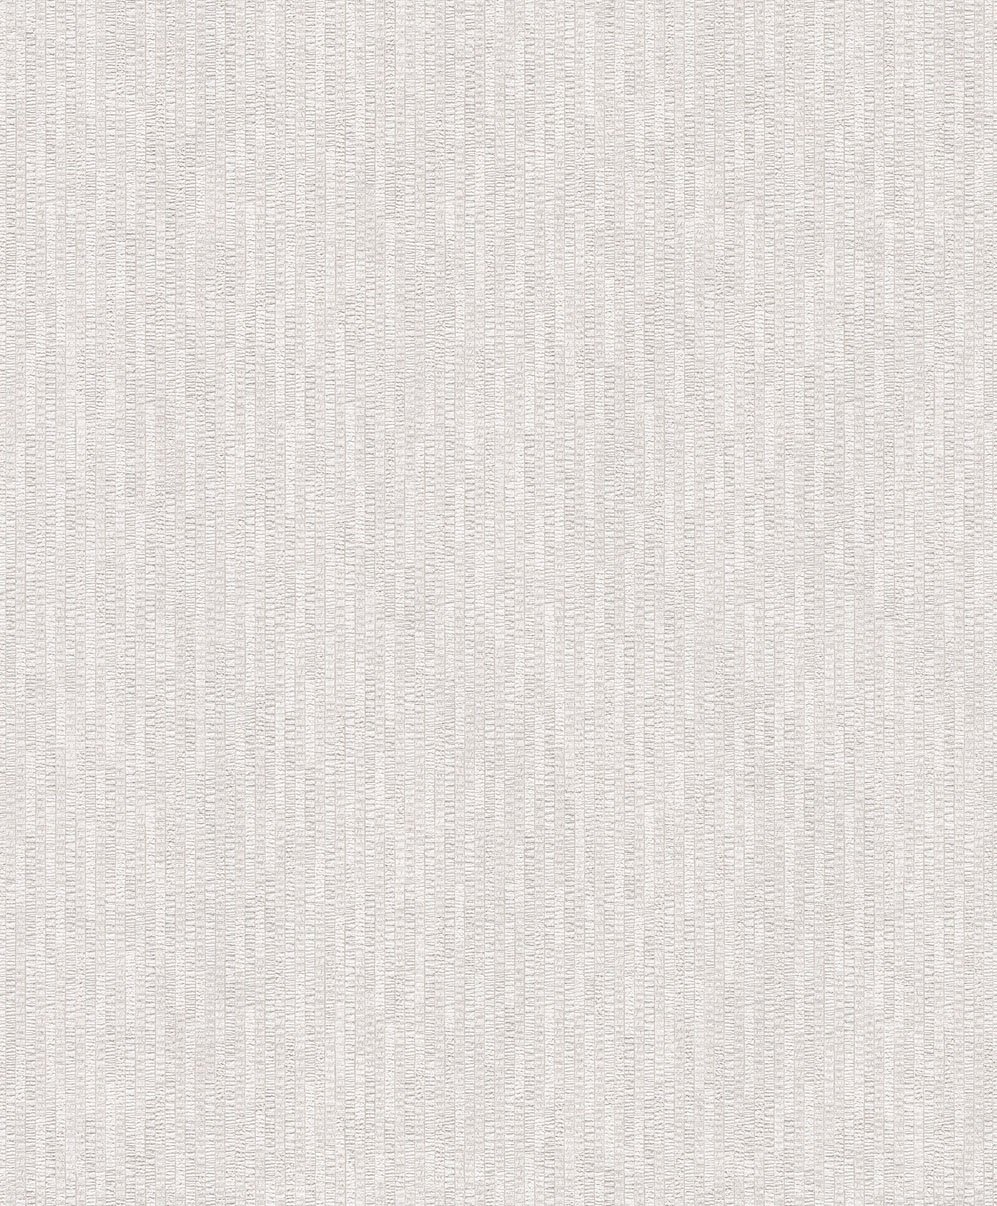 Обои Grandeco Nuances NU1401 — Грандеко Нюанс